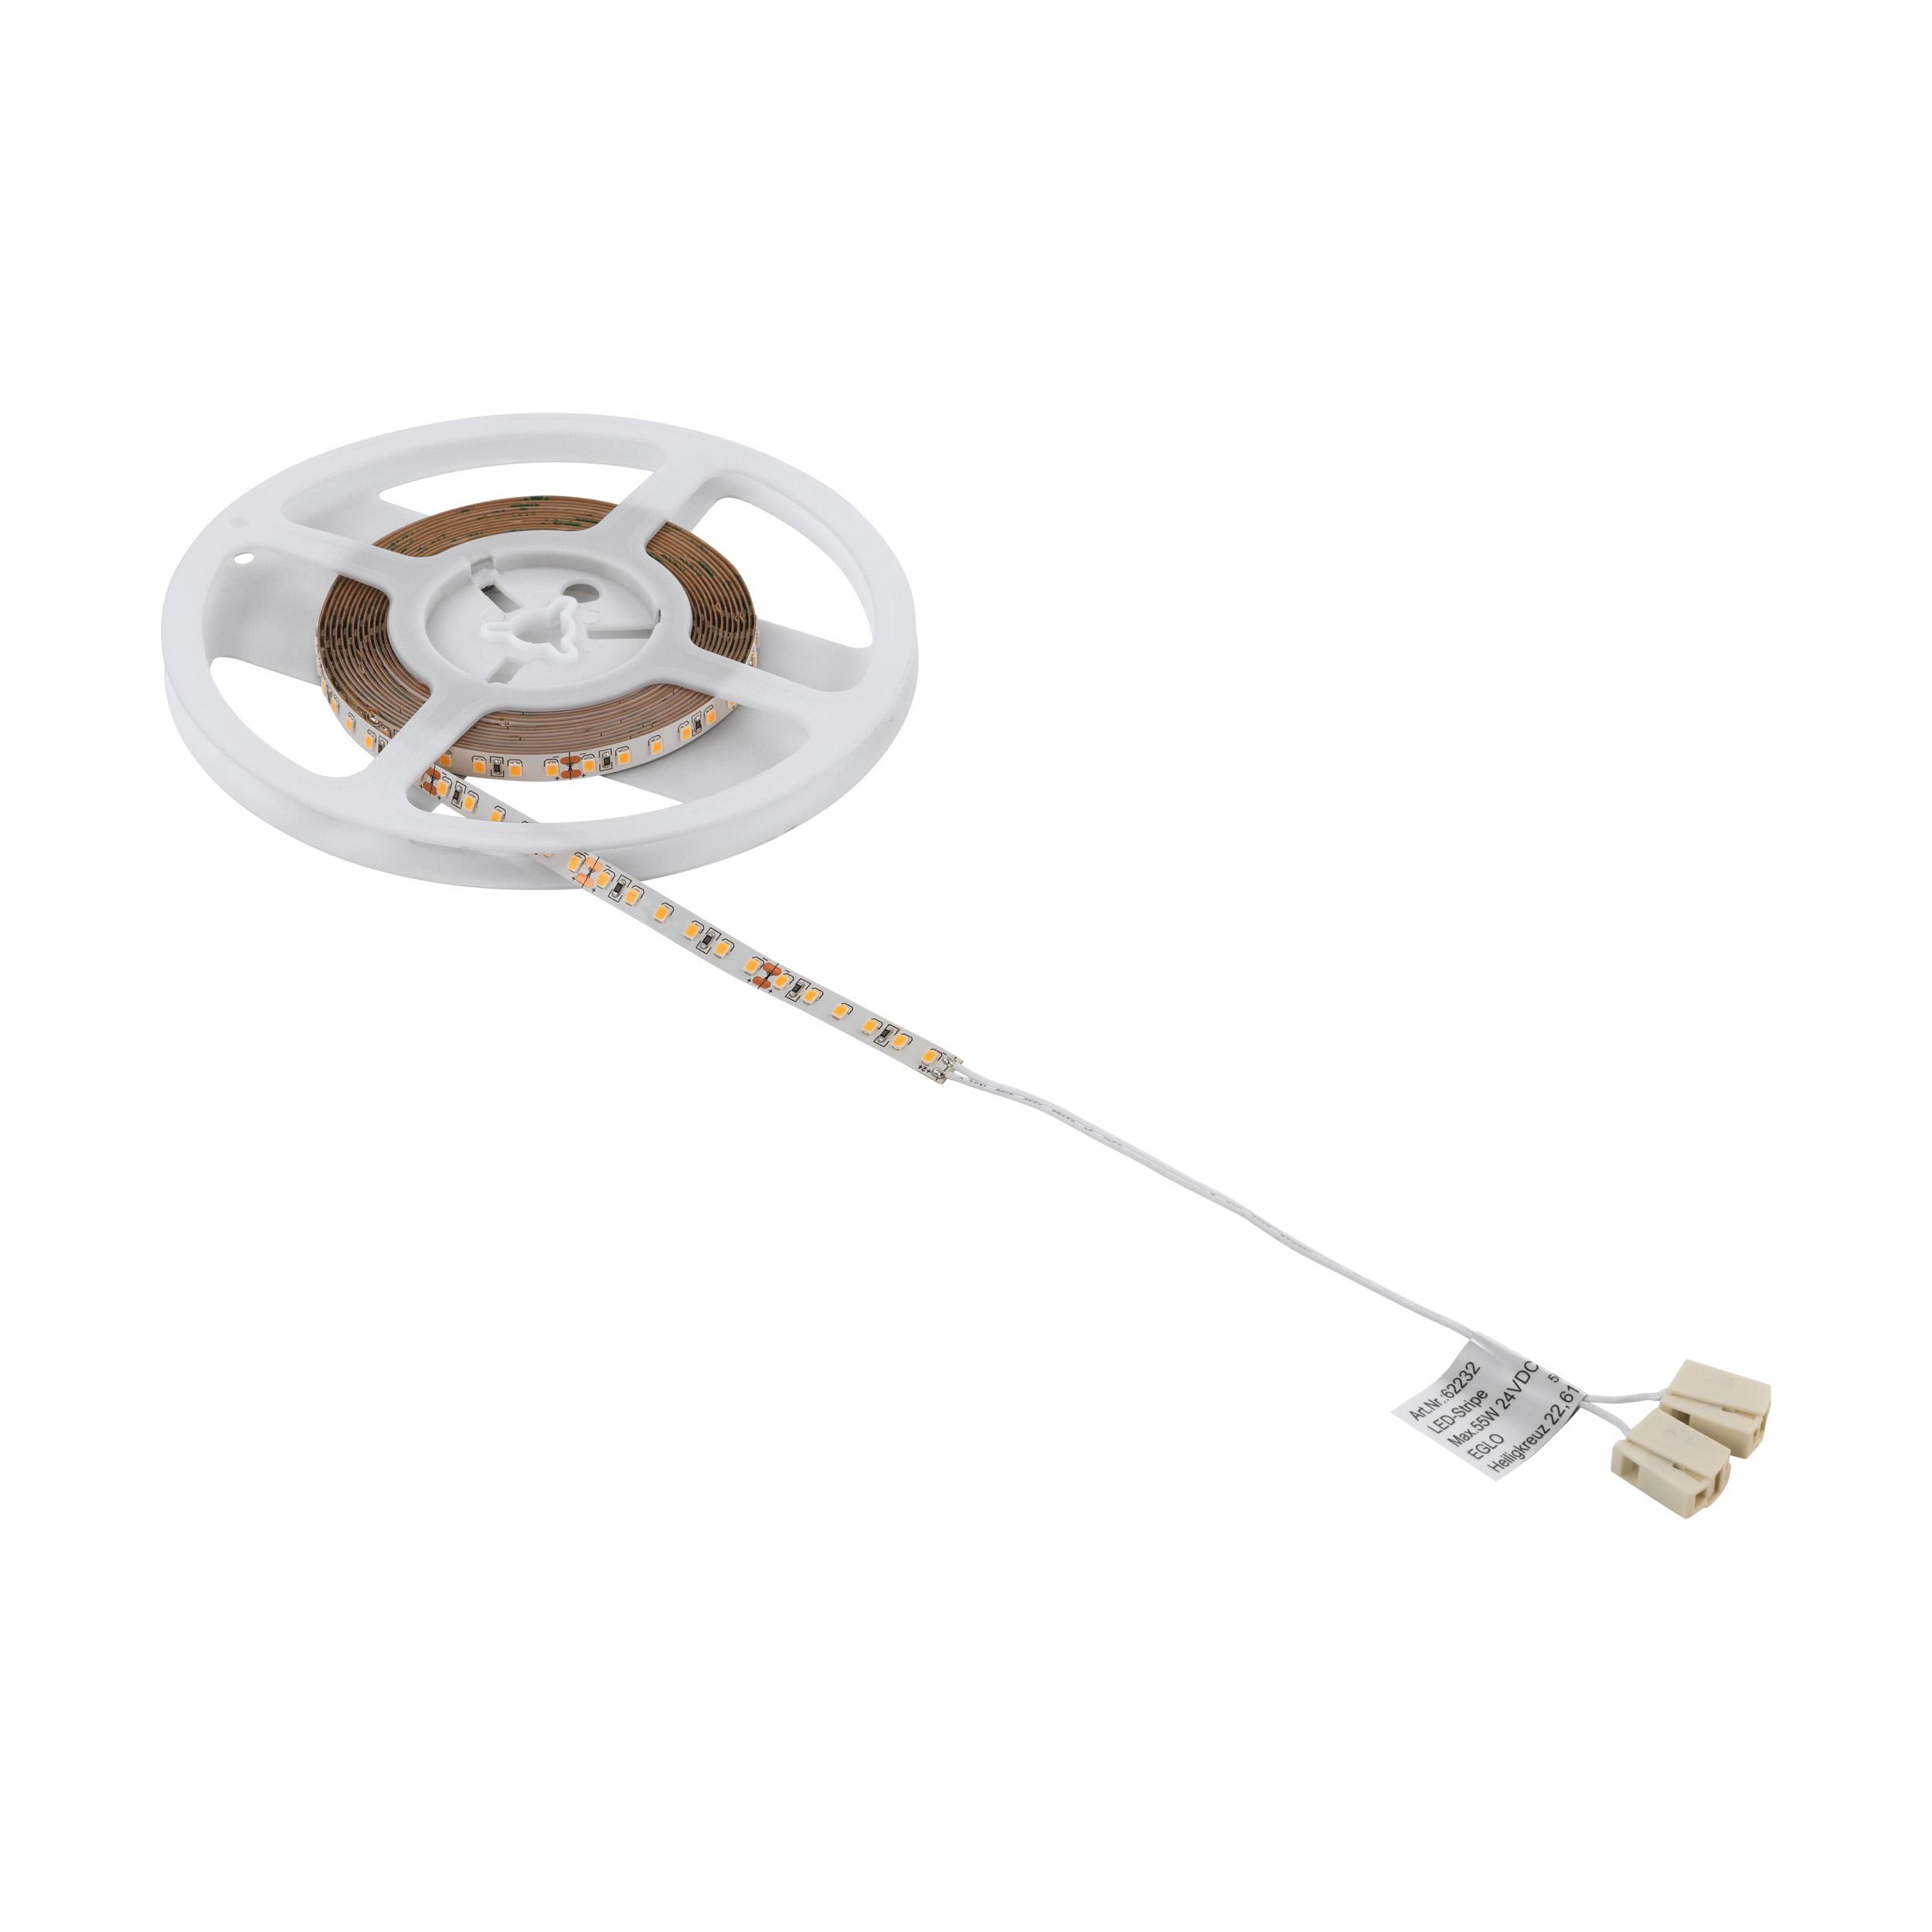 1 Stk LED-Stripe 5m Rolle, Angaben per Meter 11W 3000K IP20 LI62233---